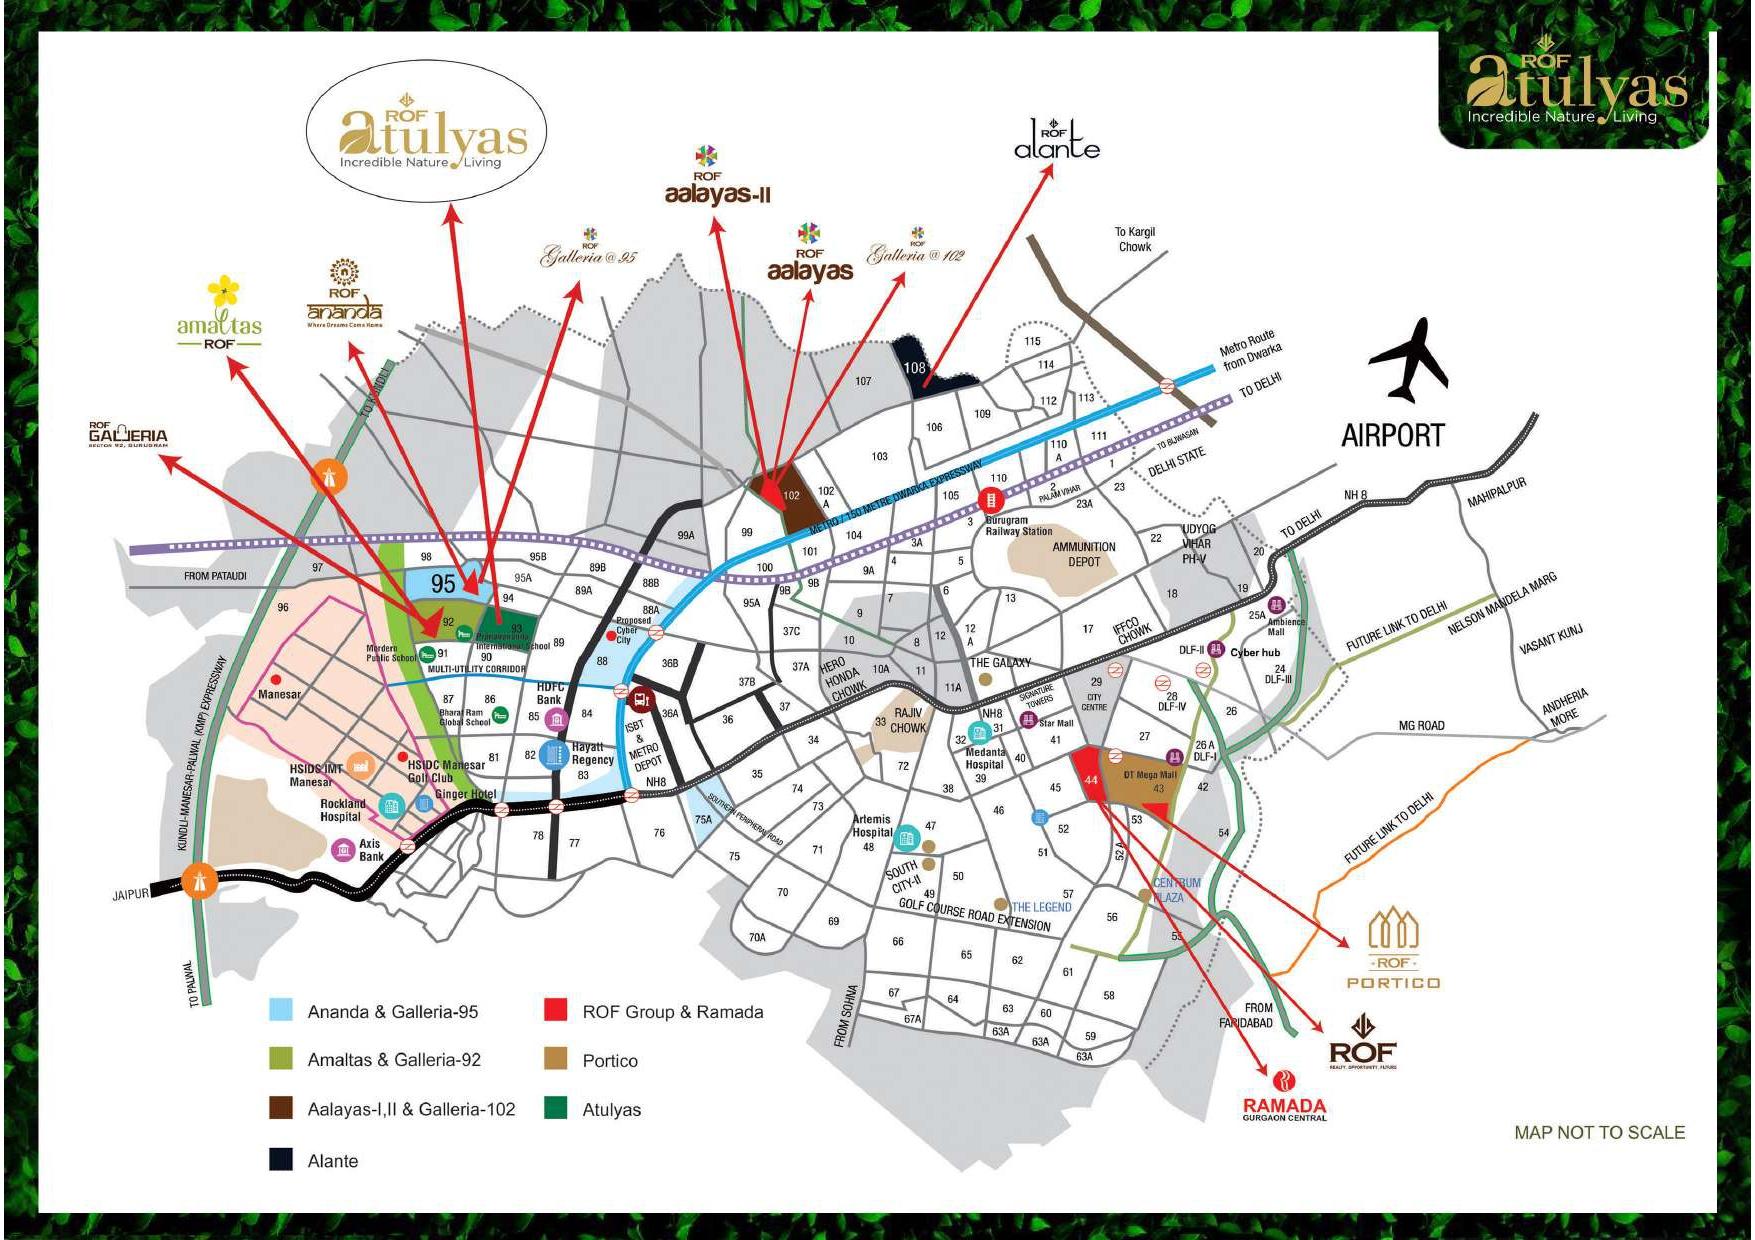 ROF Atulyas Sector 93 Layout Plan